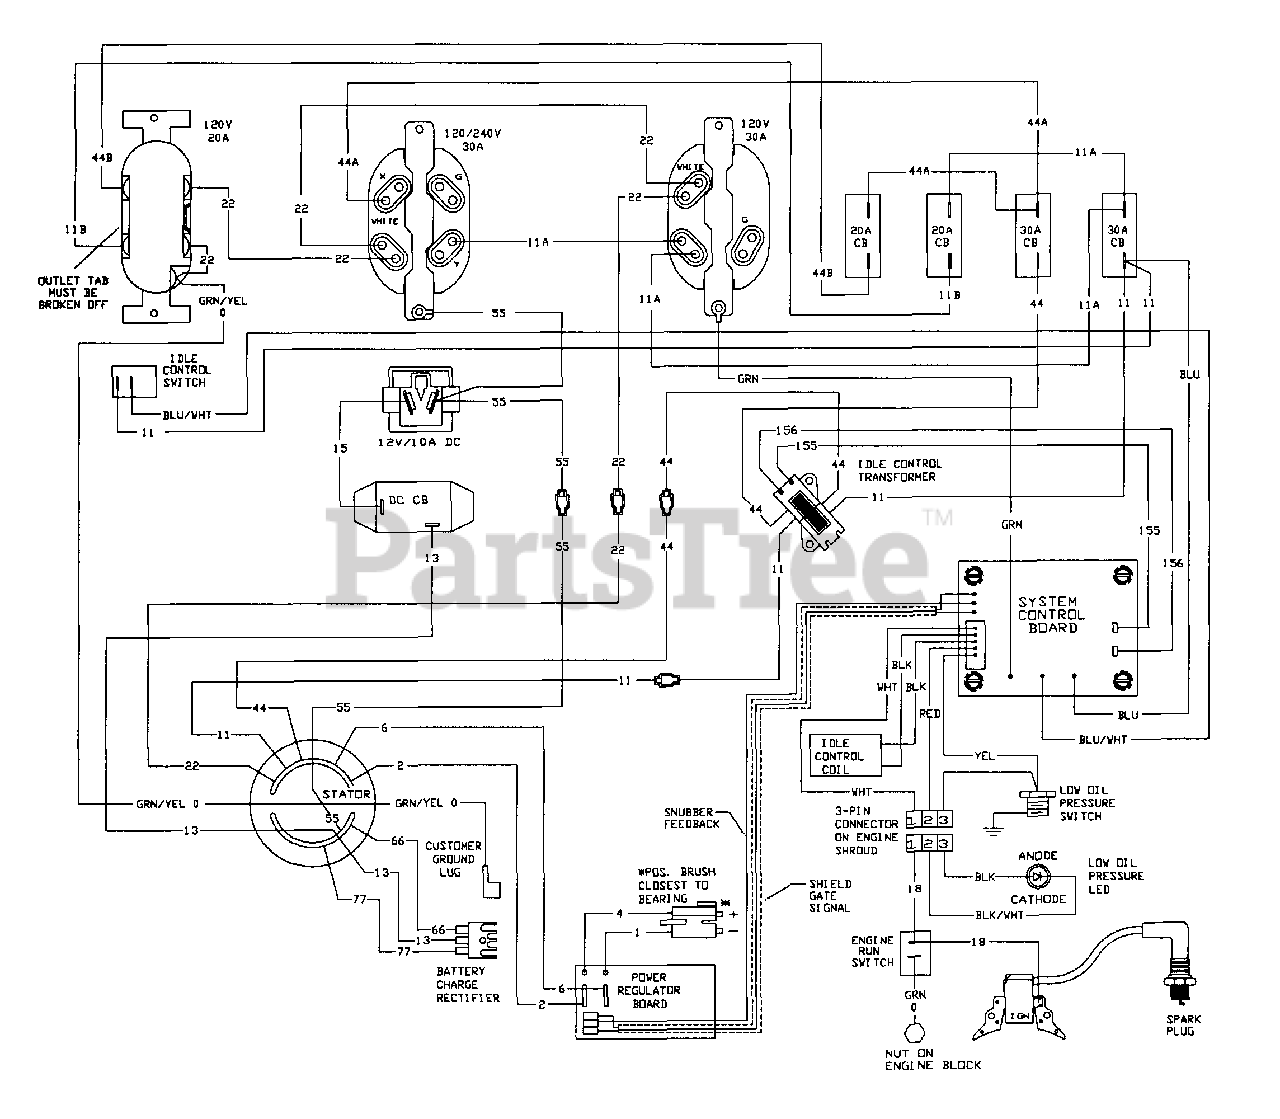 [DIAGRAM] Generac 5500 Watt Generator Wiring Diagram FULL